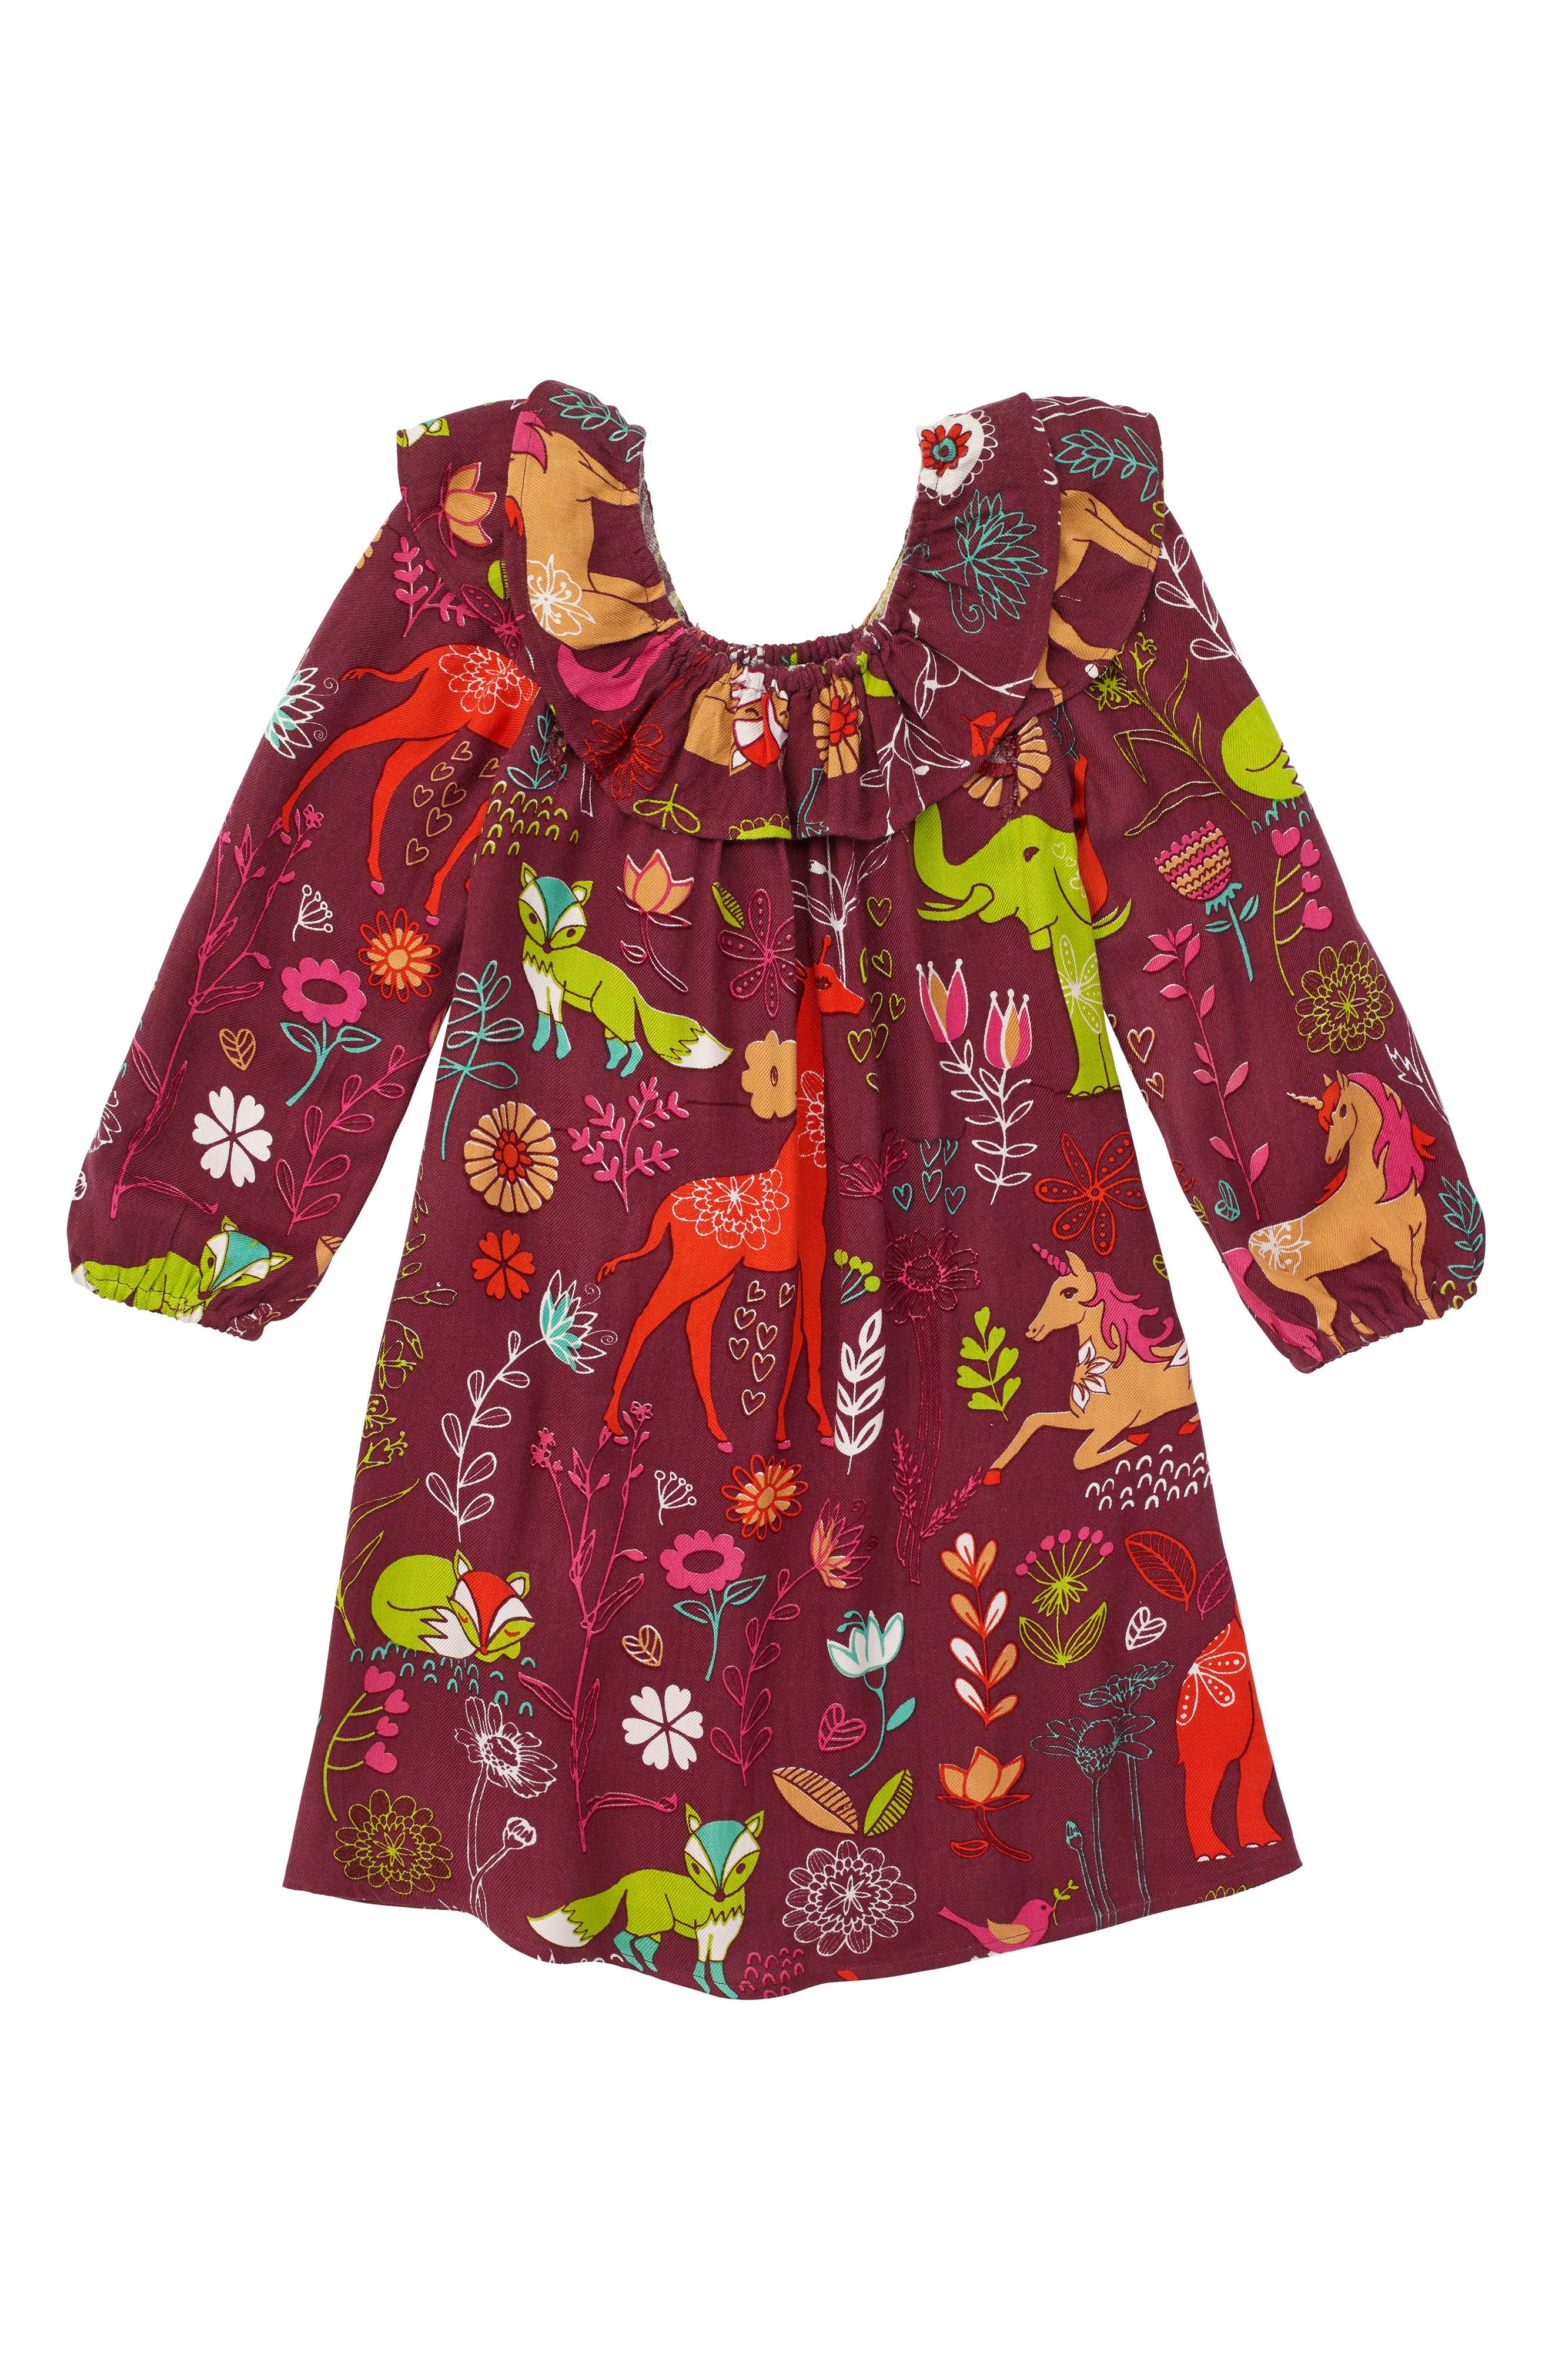 Alternate Image 1 Selected - Masalababy Magic Forest Print Dress (Toddler Girls, Little Girls & Big Girls)